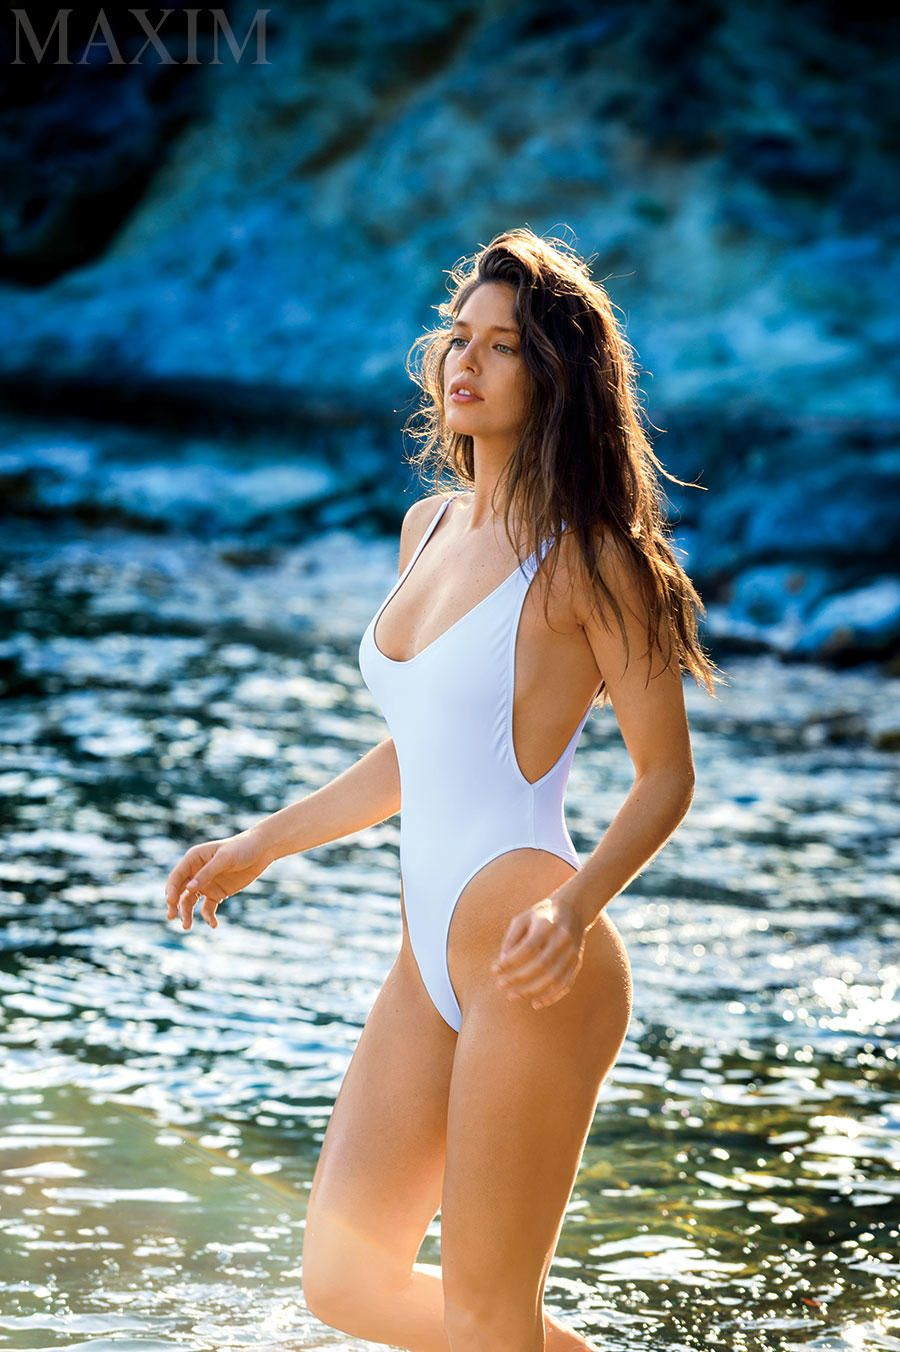 eb41067cd3b3b Bask In The Glorious Beauty of Supermodel Emily Didonato s Hottest Pics -  Maxim